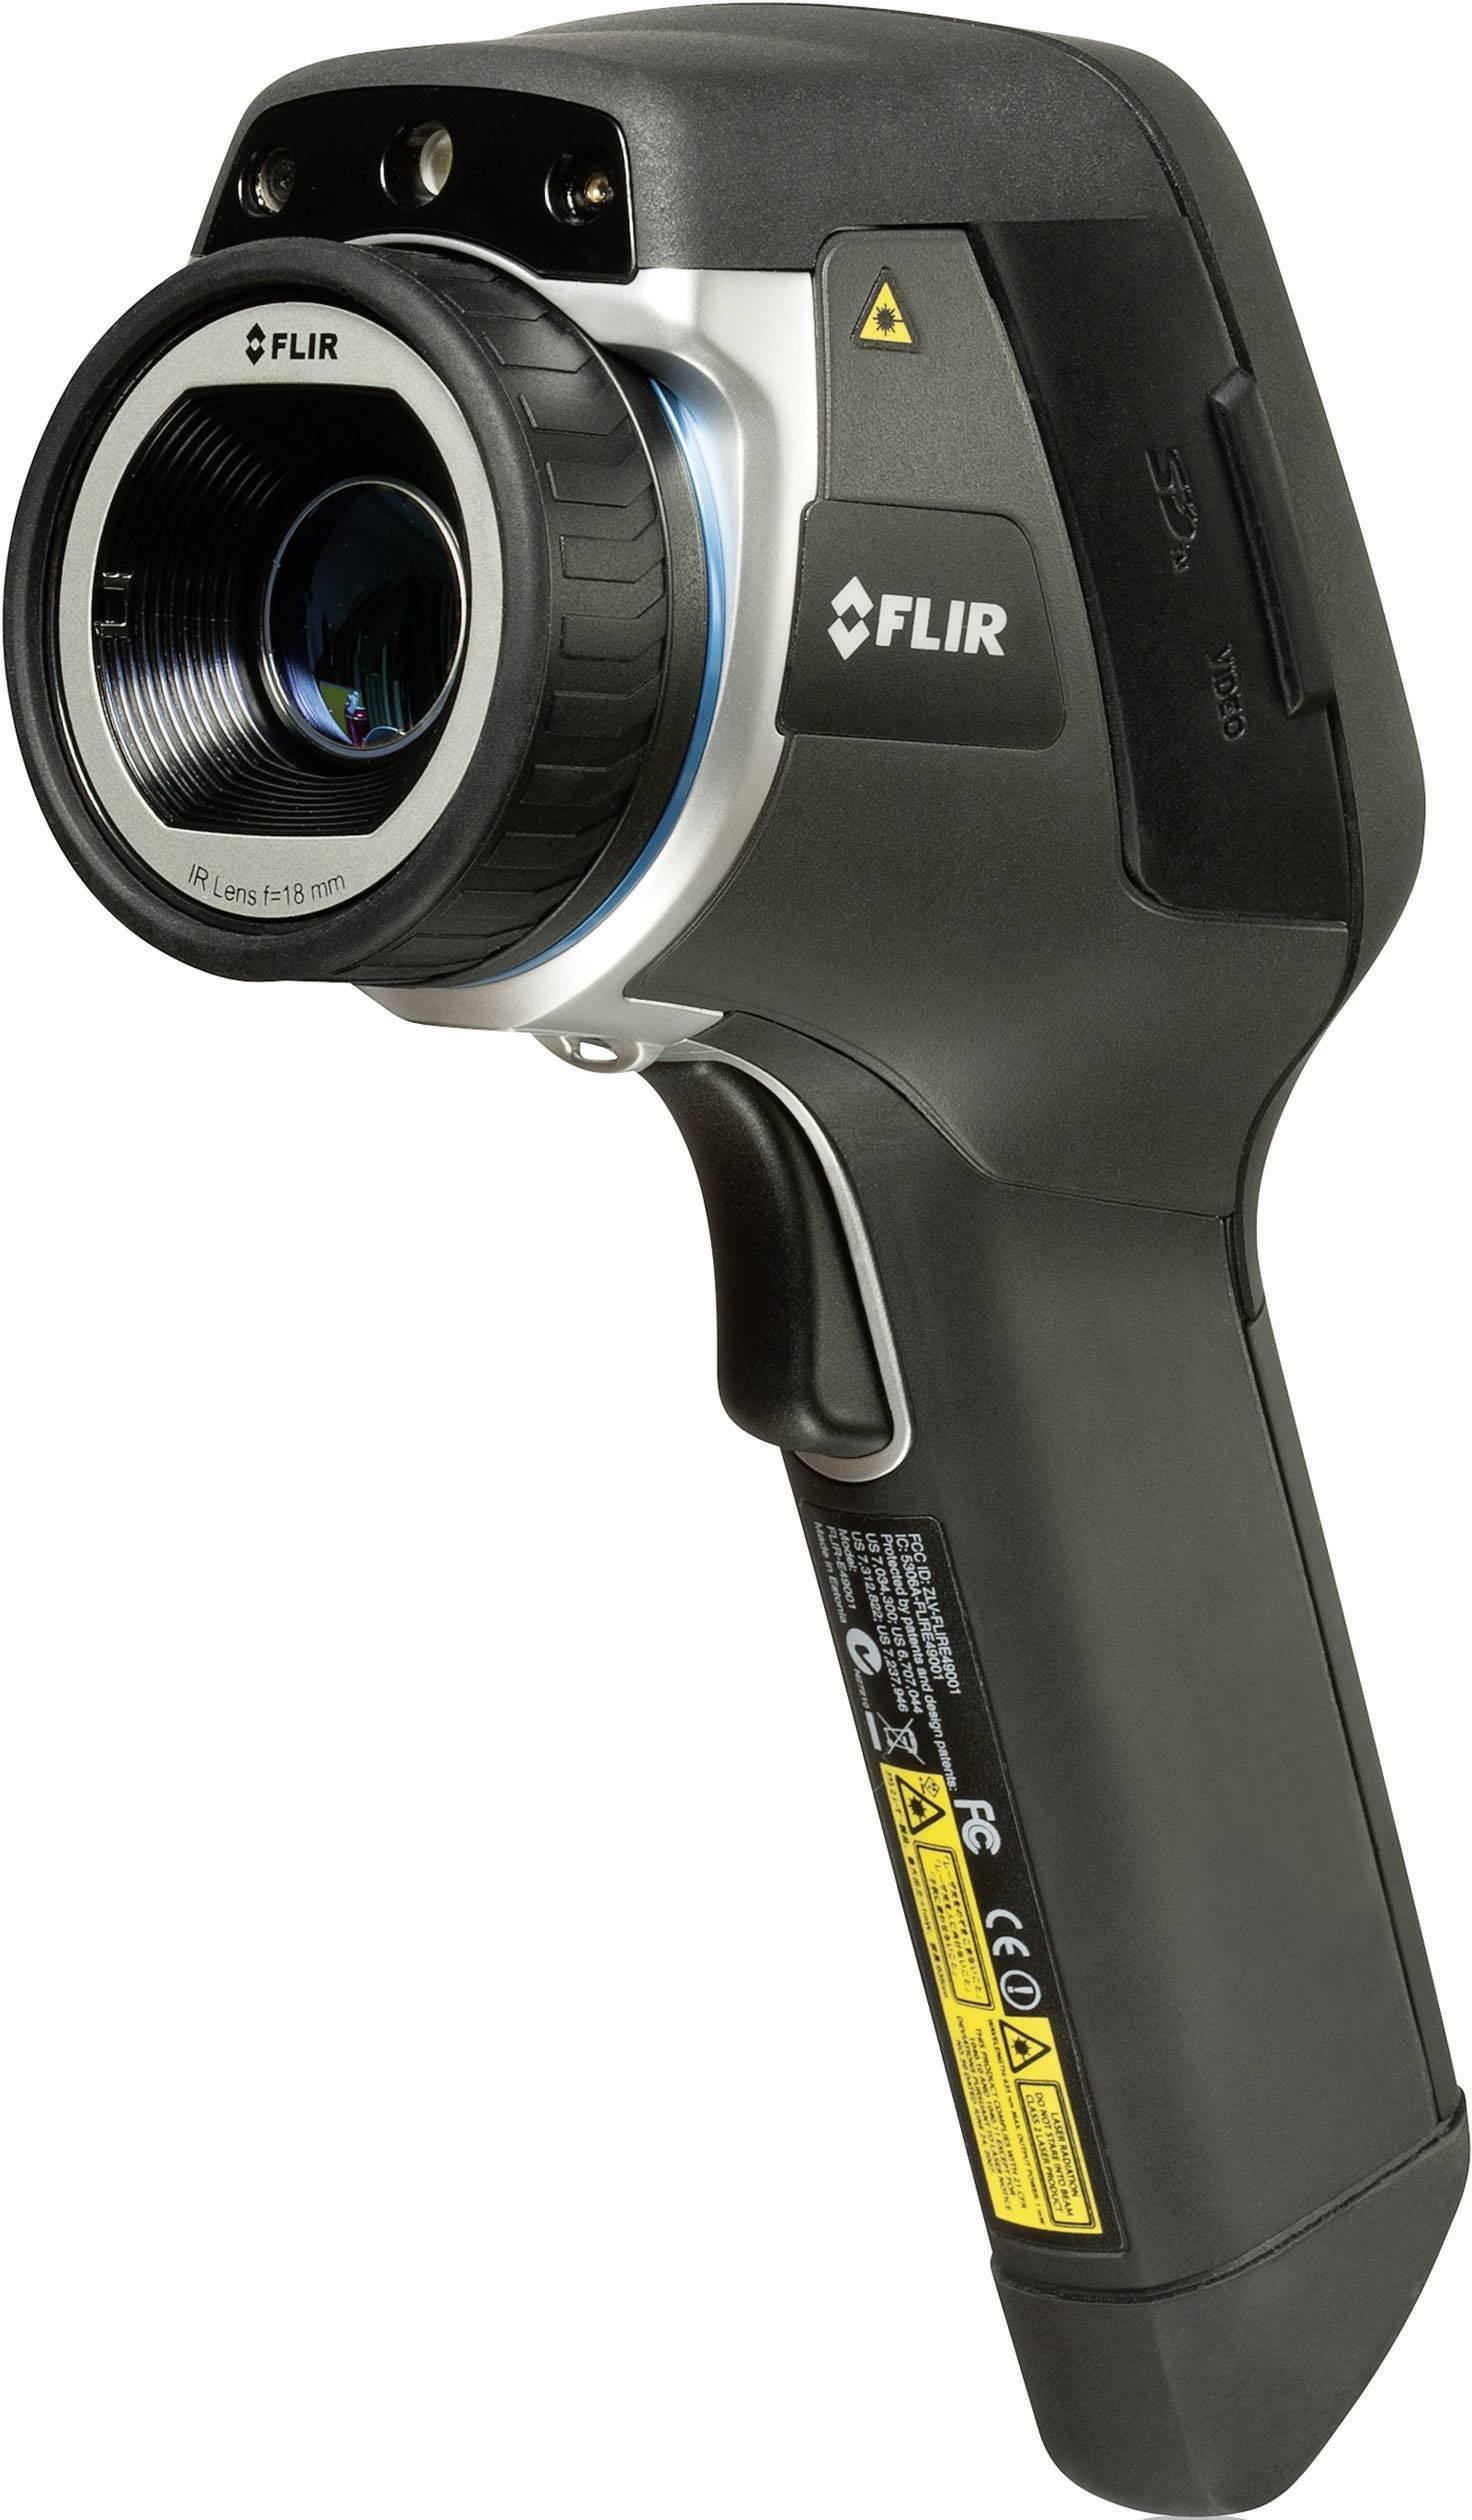 Termokamera Flir E60 EDU, 0 až 650 °C, 320 x 240 px, Wi-Fi, funkce MSX